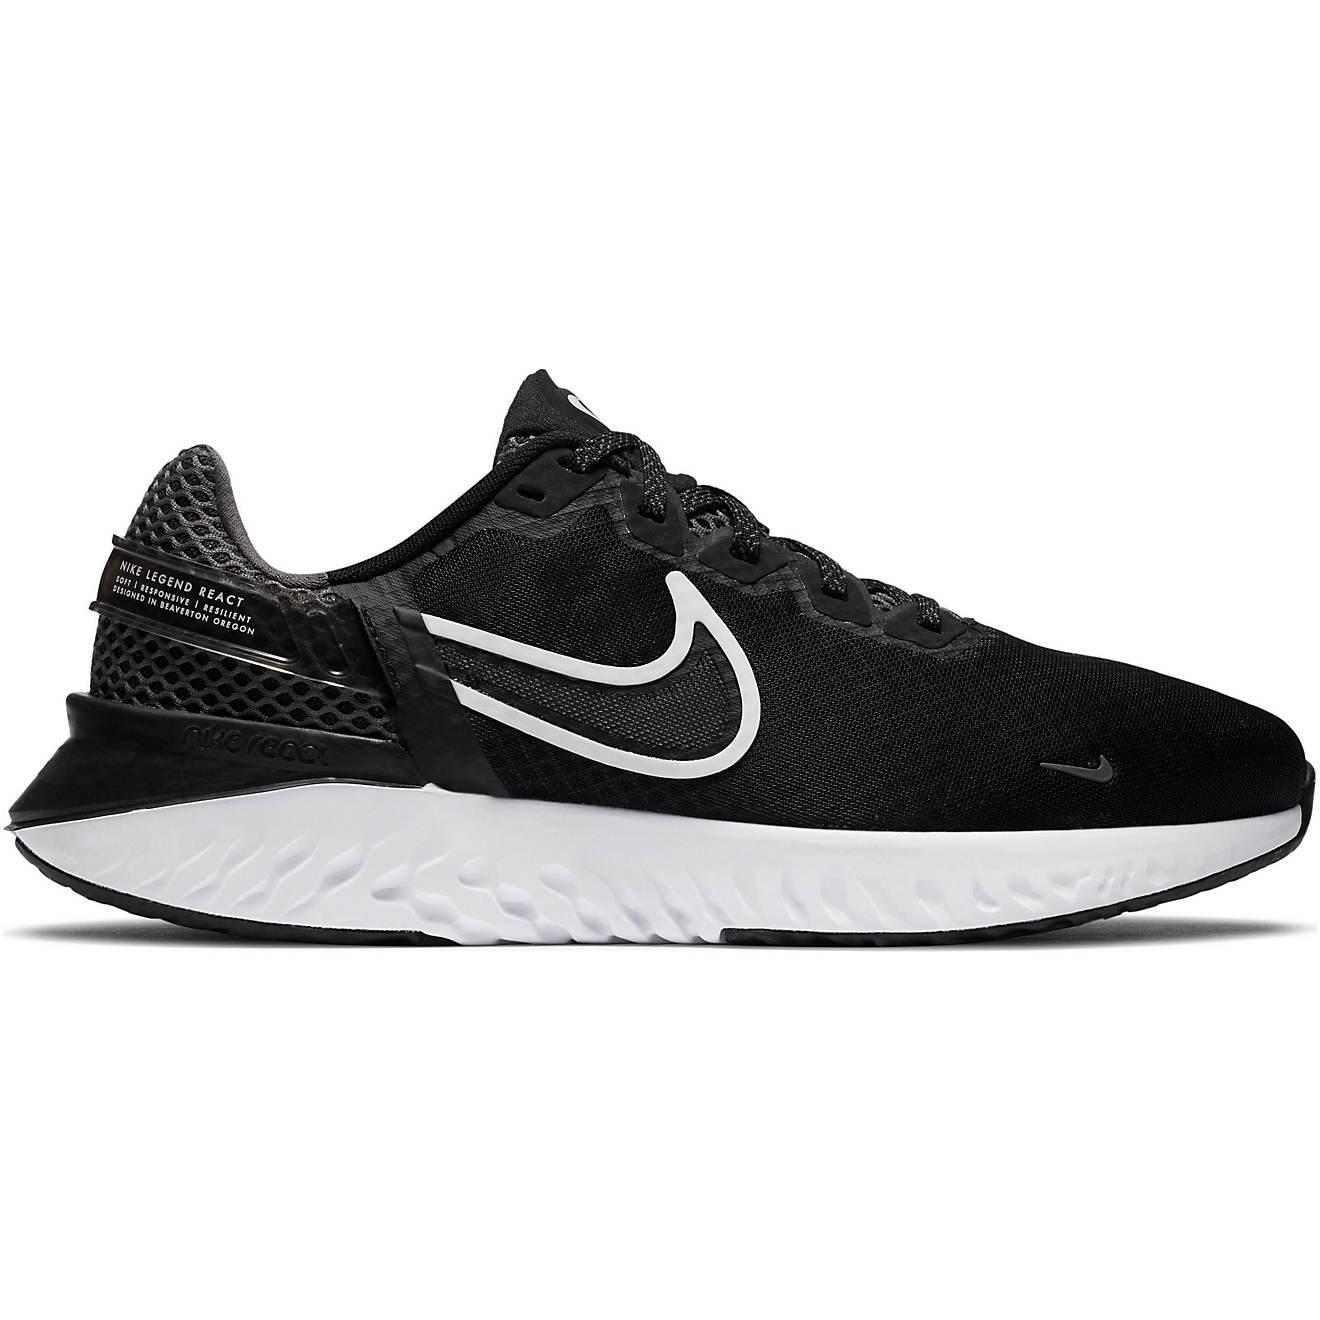 Nike Men's Legend React 3 Running Shoes | Academy